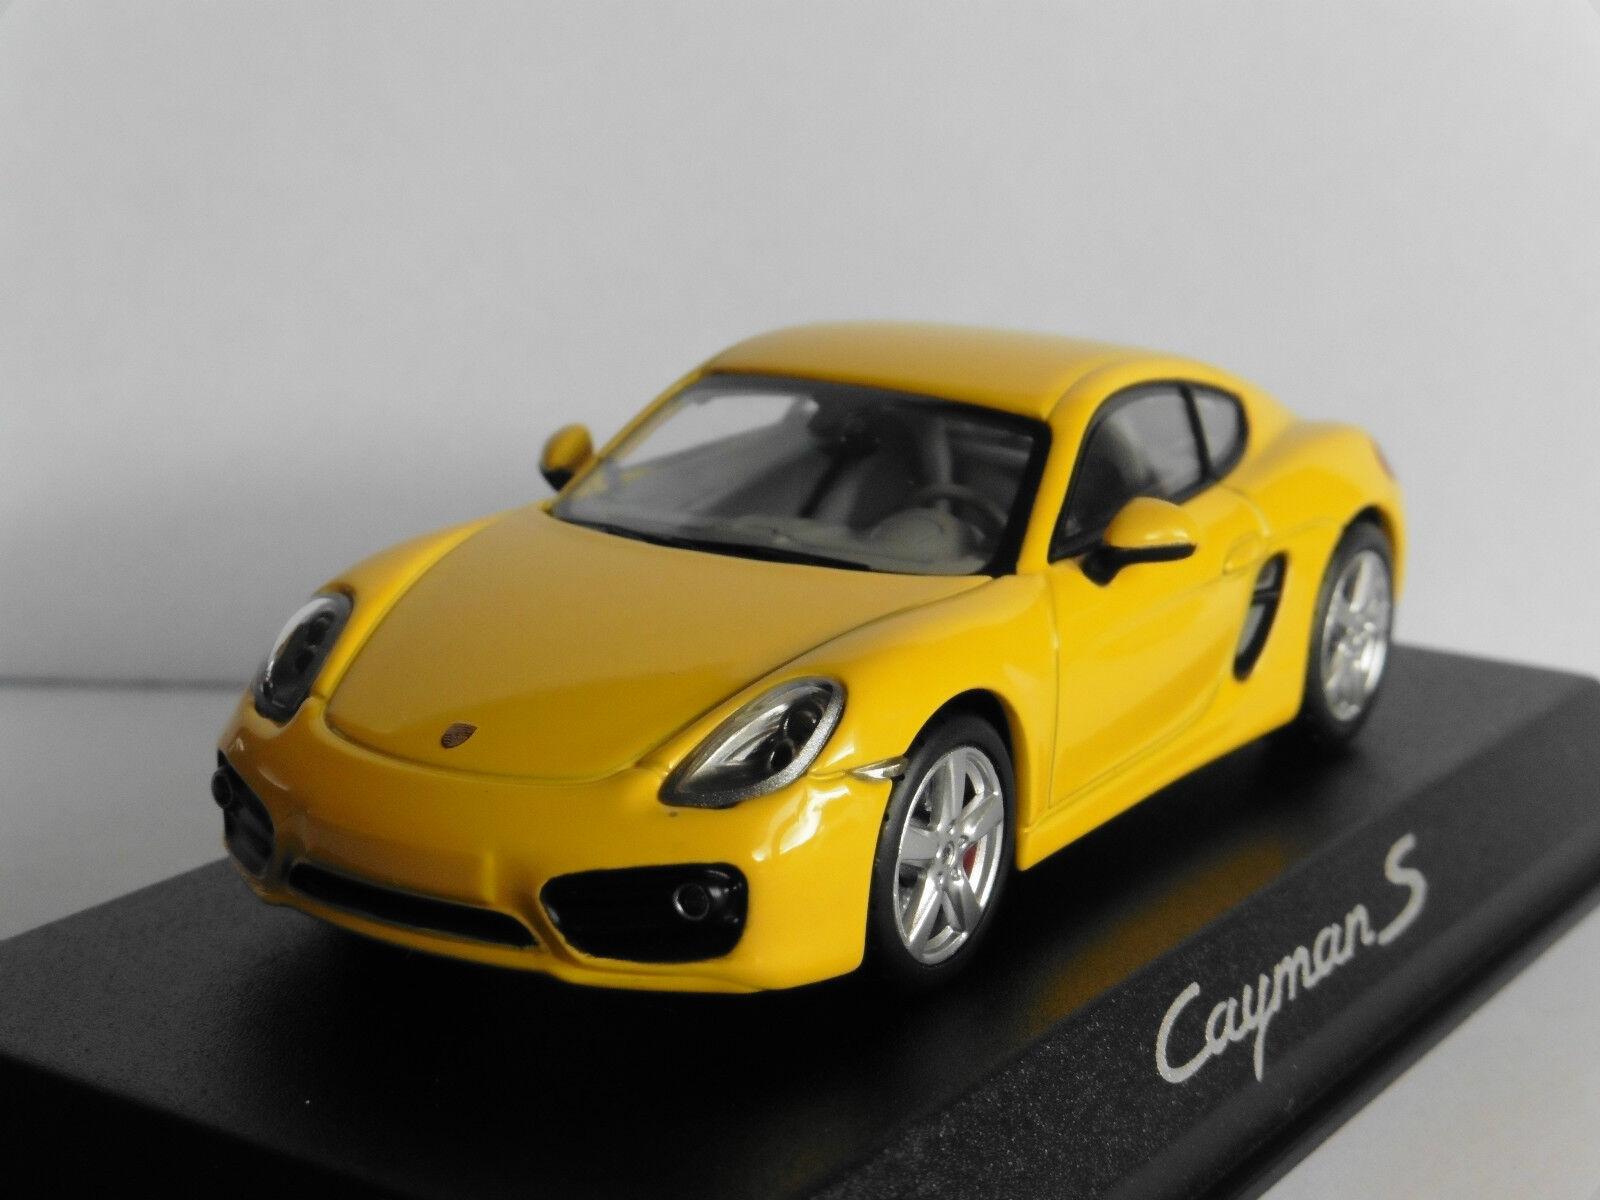 PORSCHE CAYMAN S jaune RACING MINICHAMPS WAP0200310D 1 43 JAUNE jaune